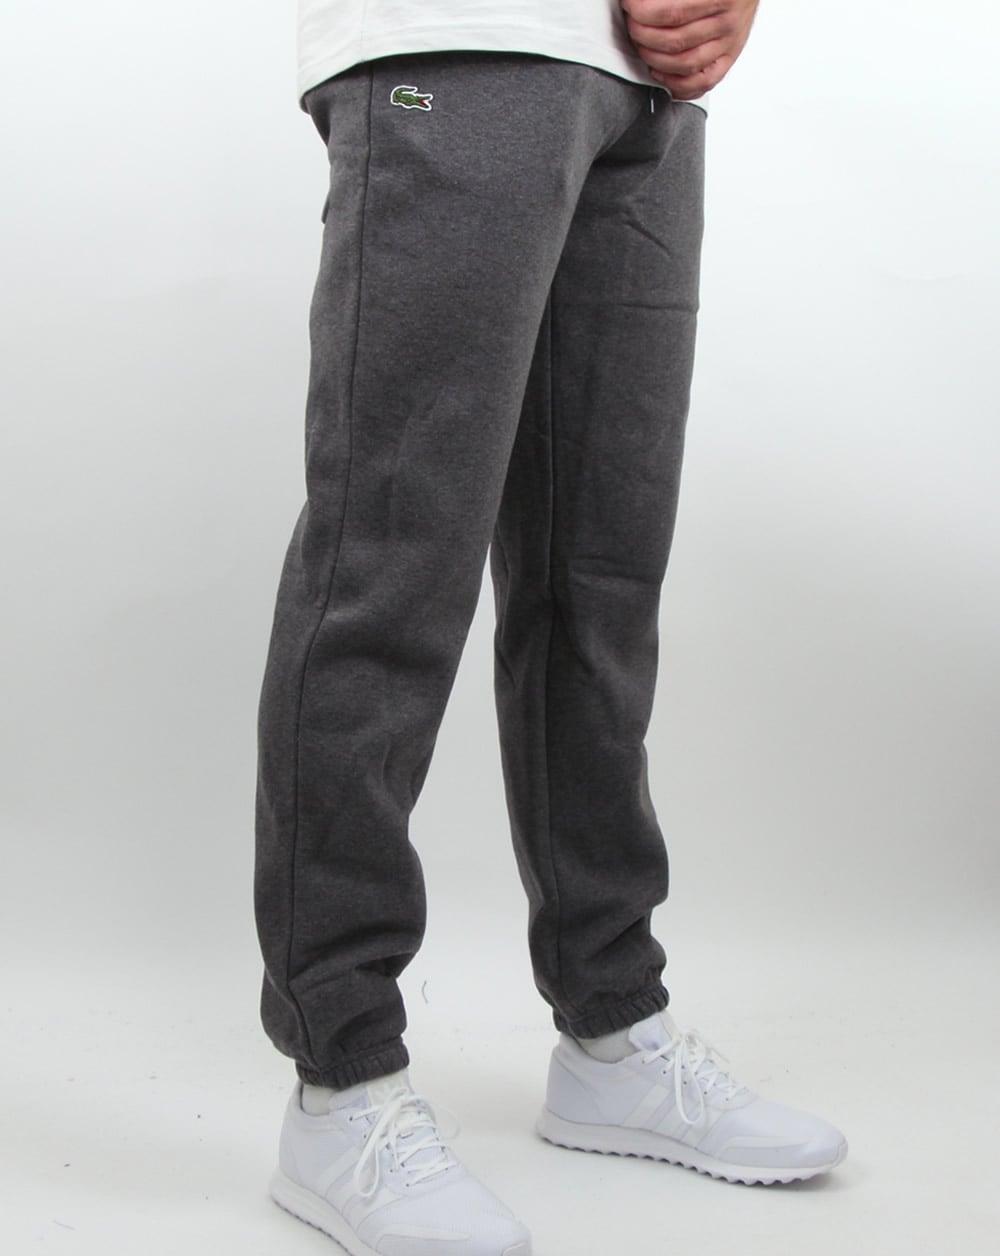 Lacoste Cotton Fleece Track Pants Dark Grey Tracksuit